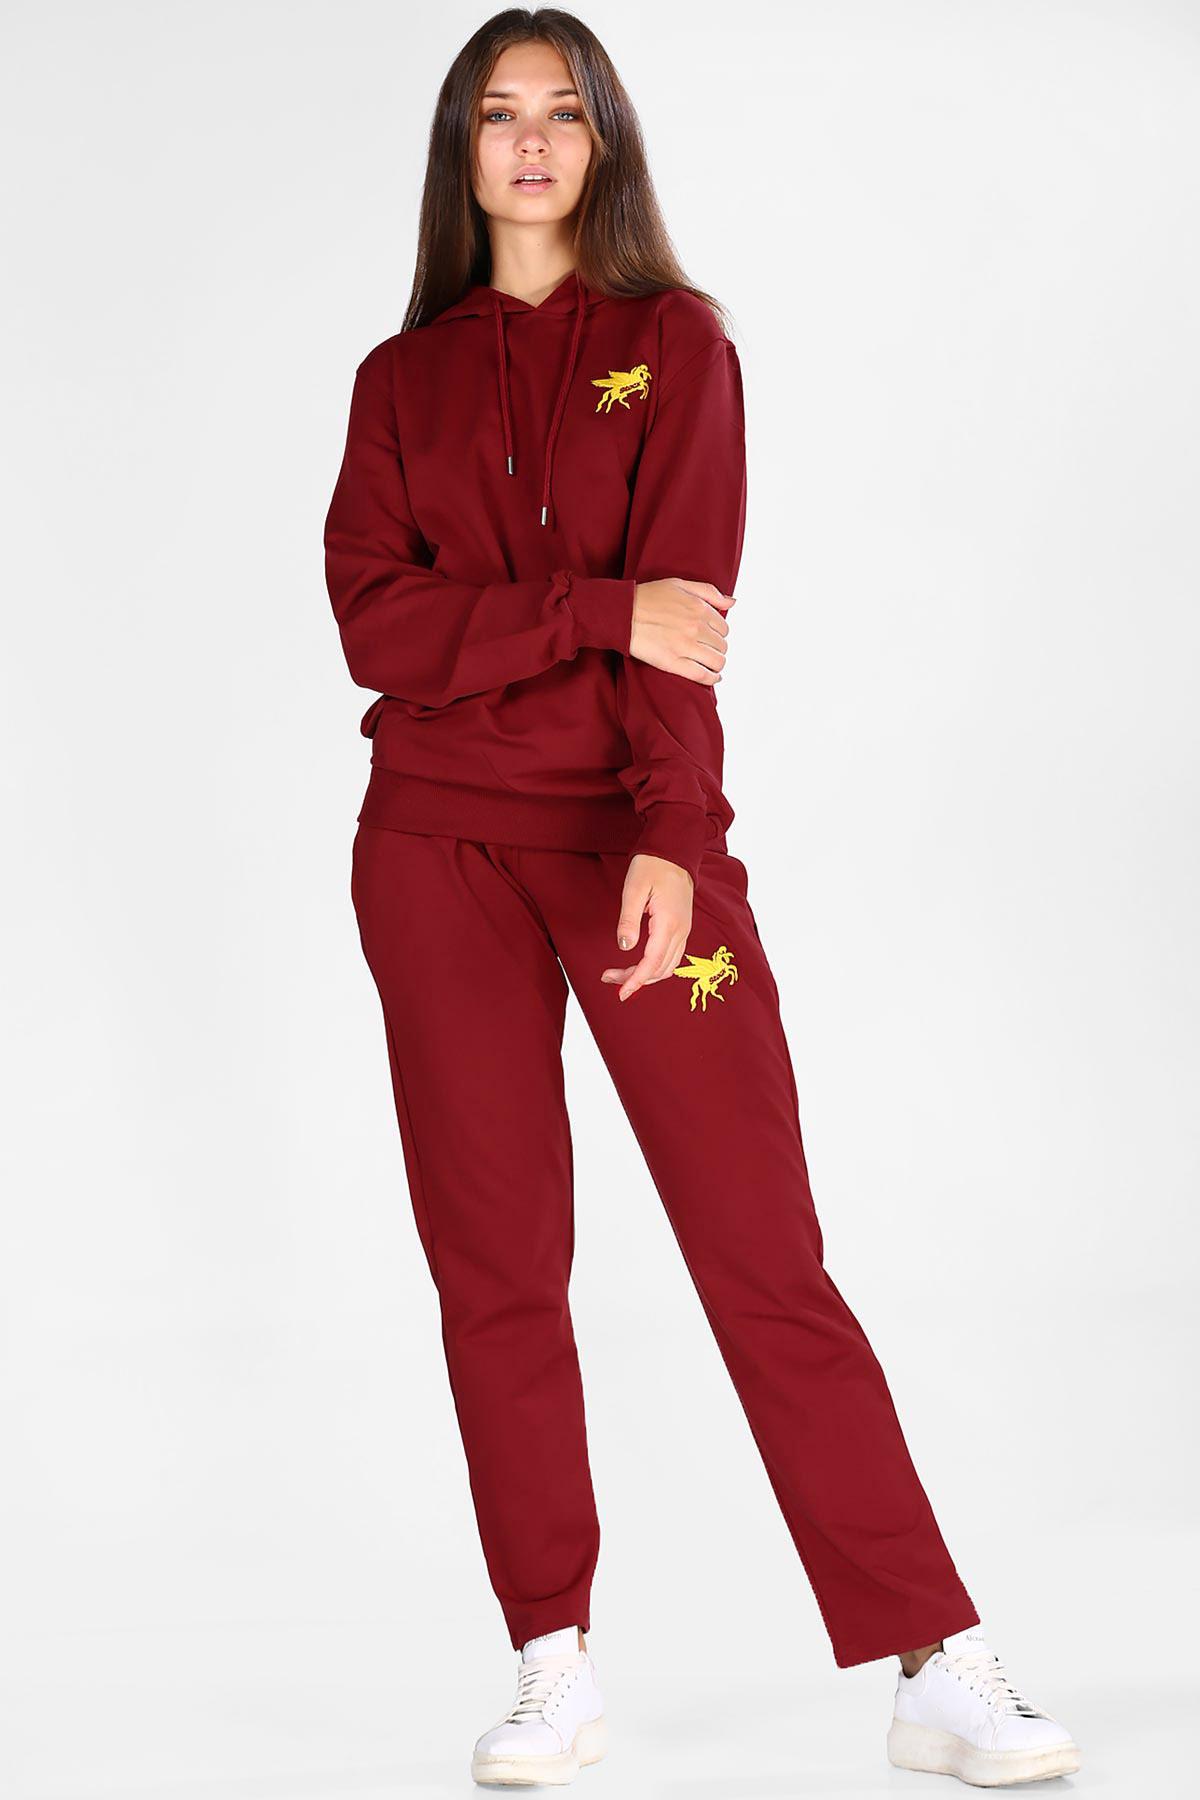 Women's Hooded Claret Red Sweat Suit